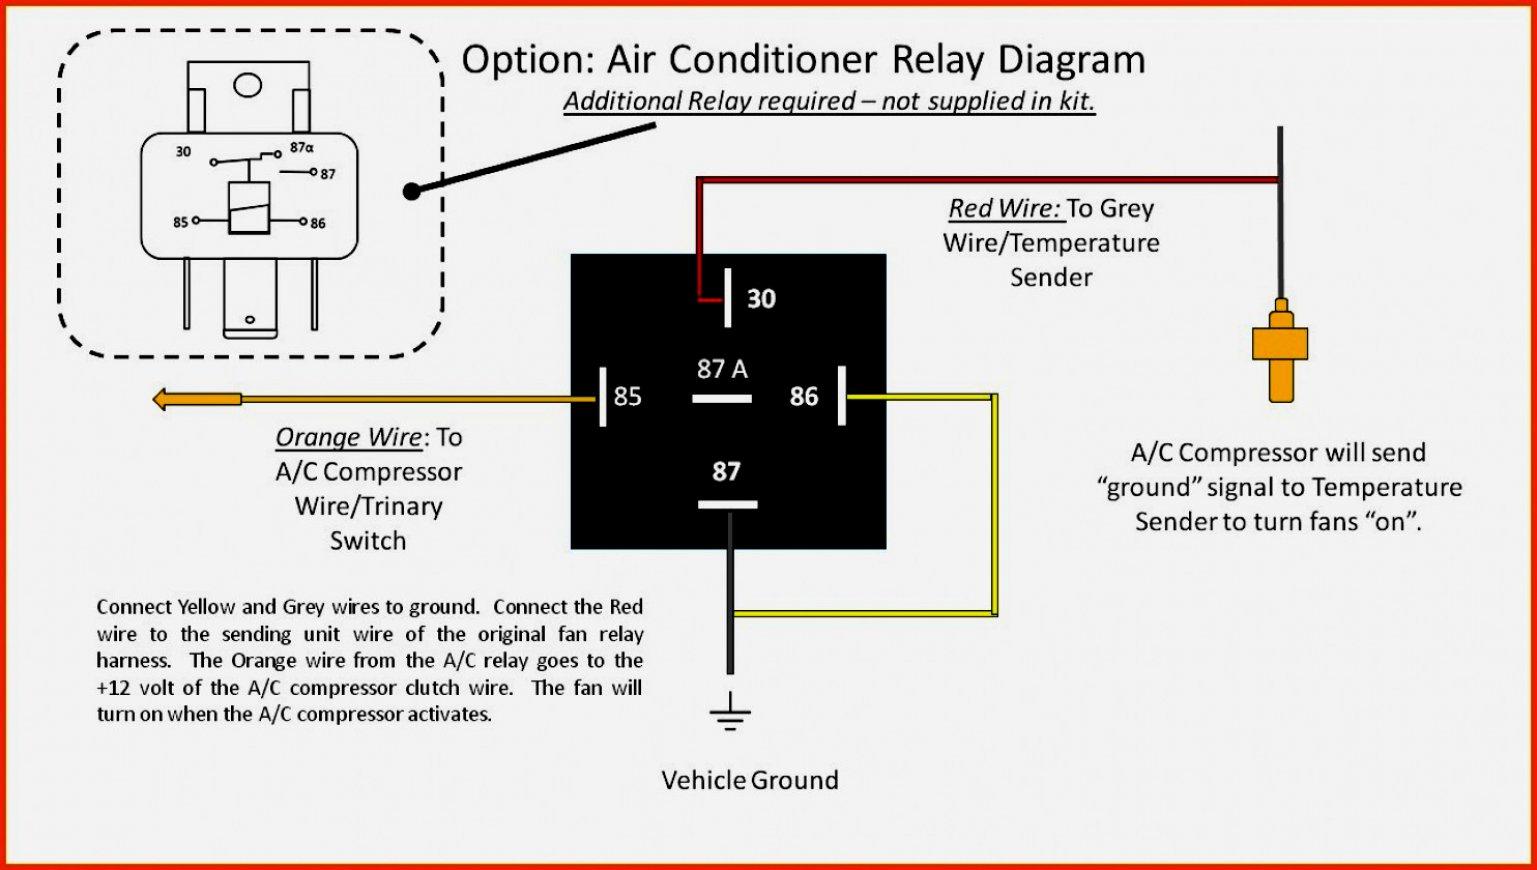 Hvac Relay Wiring - Wiring Diagram Description - Hvac Relay Wiring Diagram